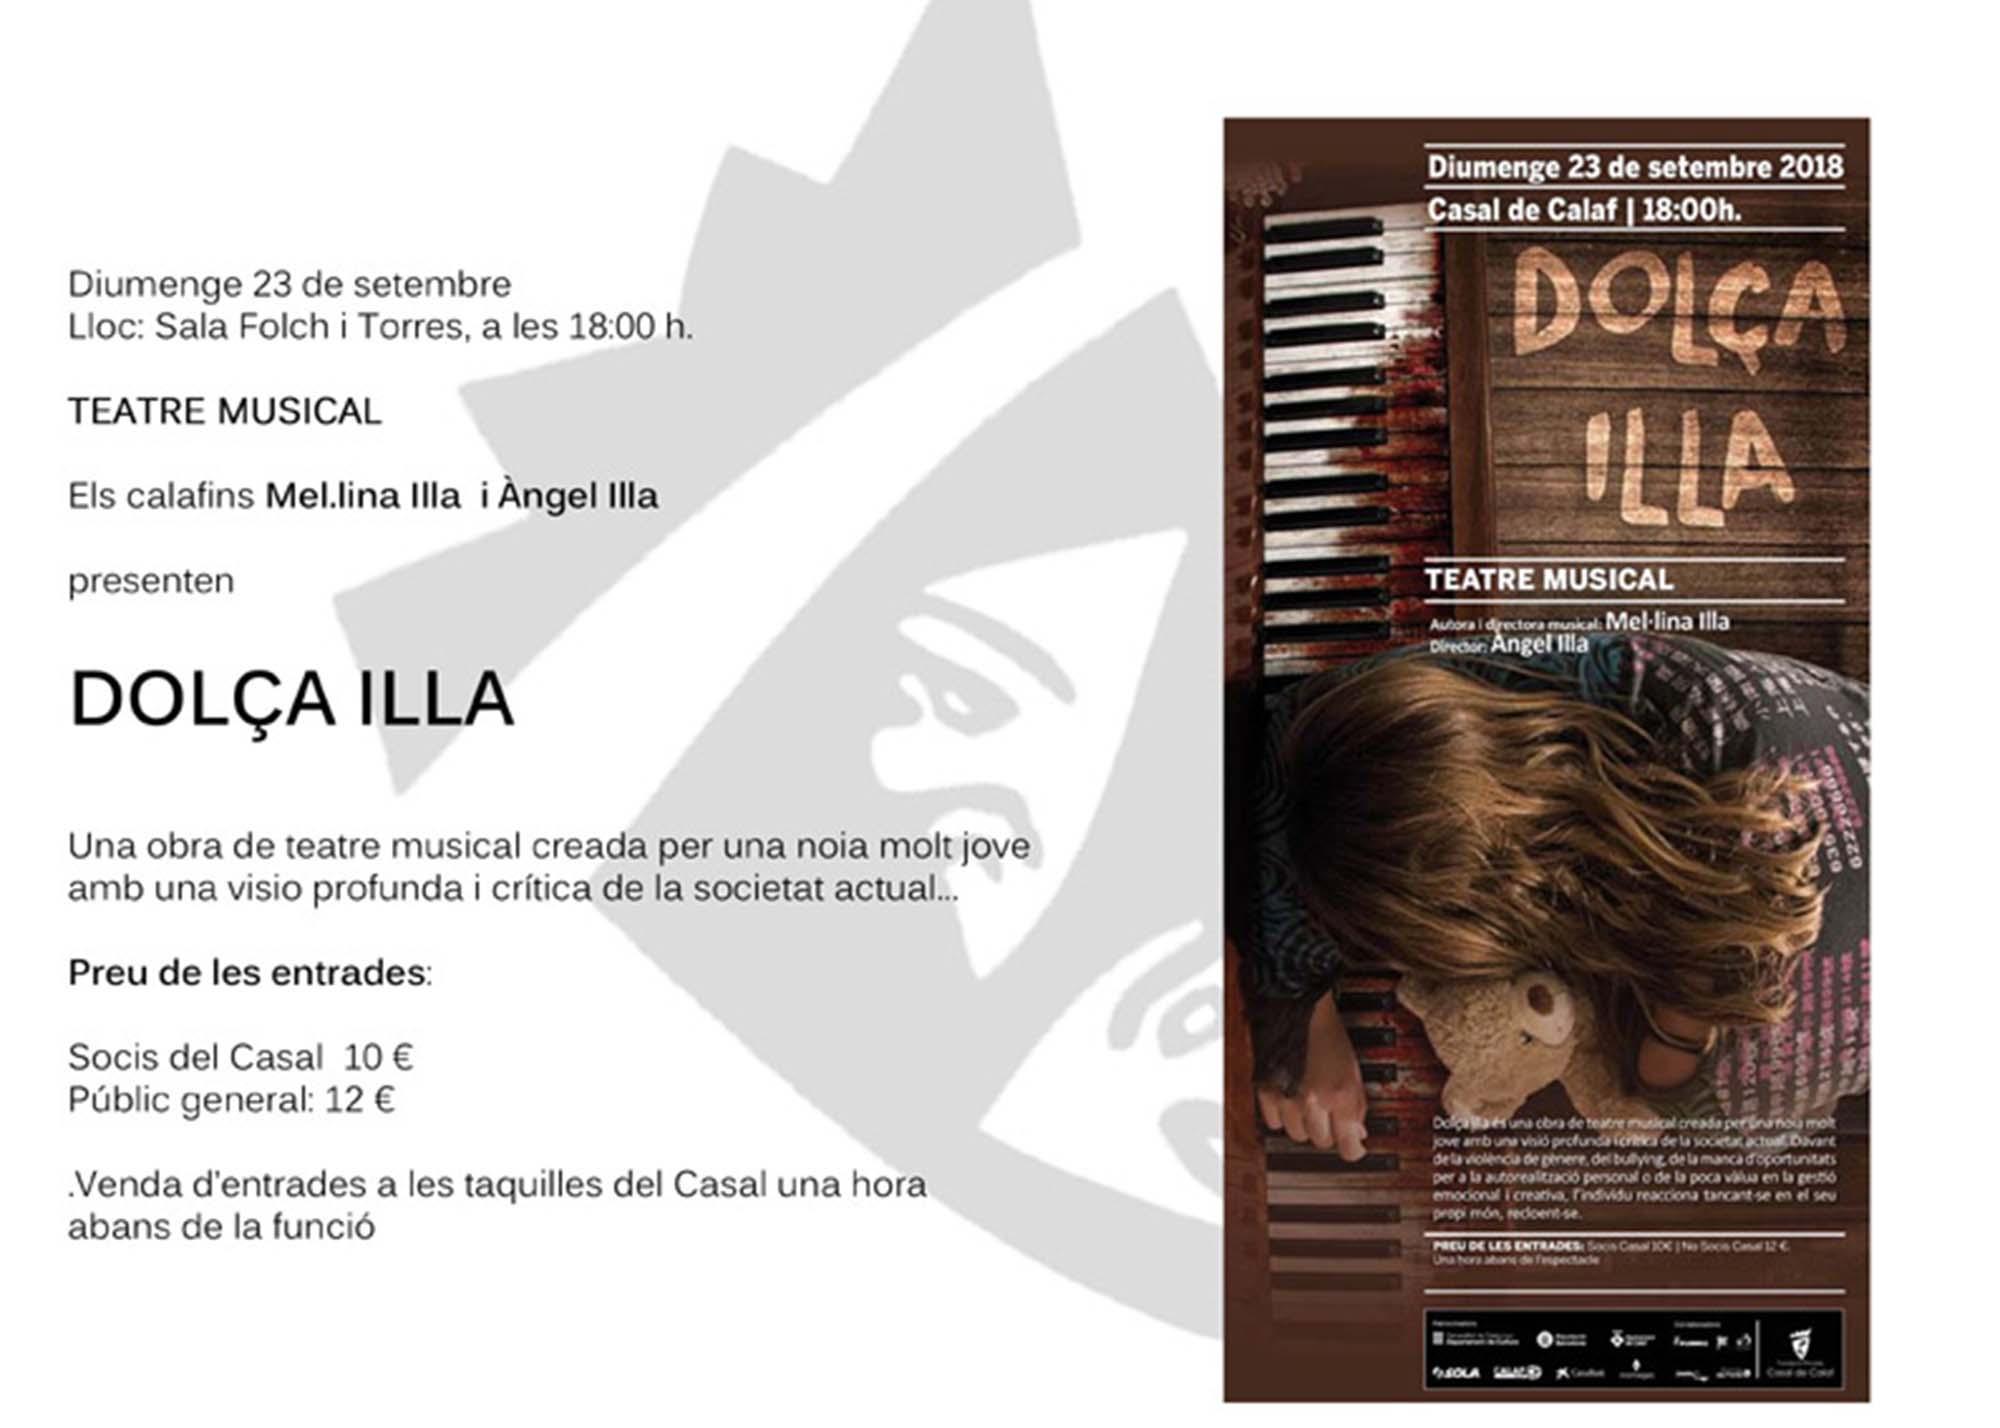 Teatre musical 'Dolça Illa'